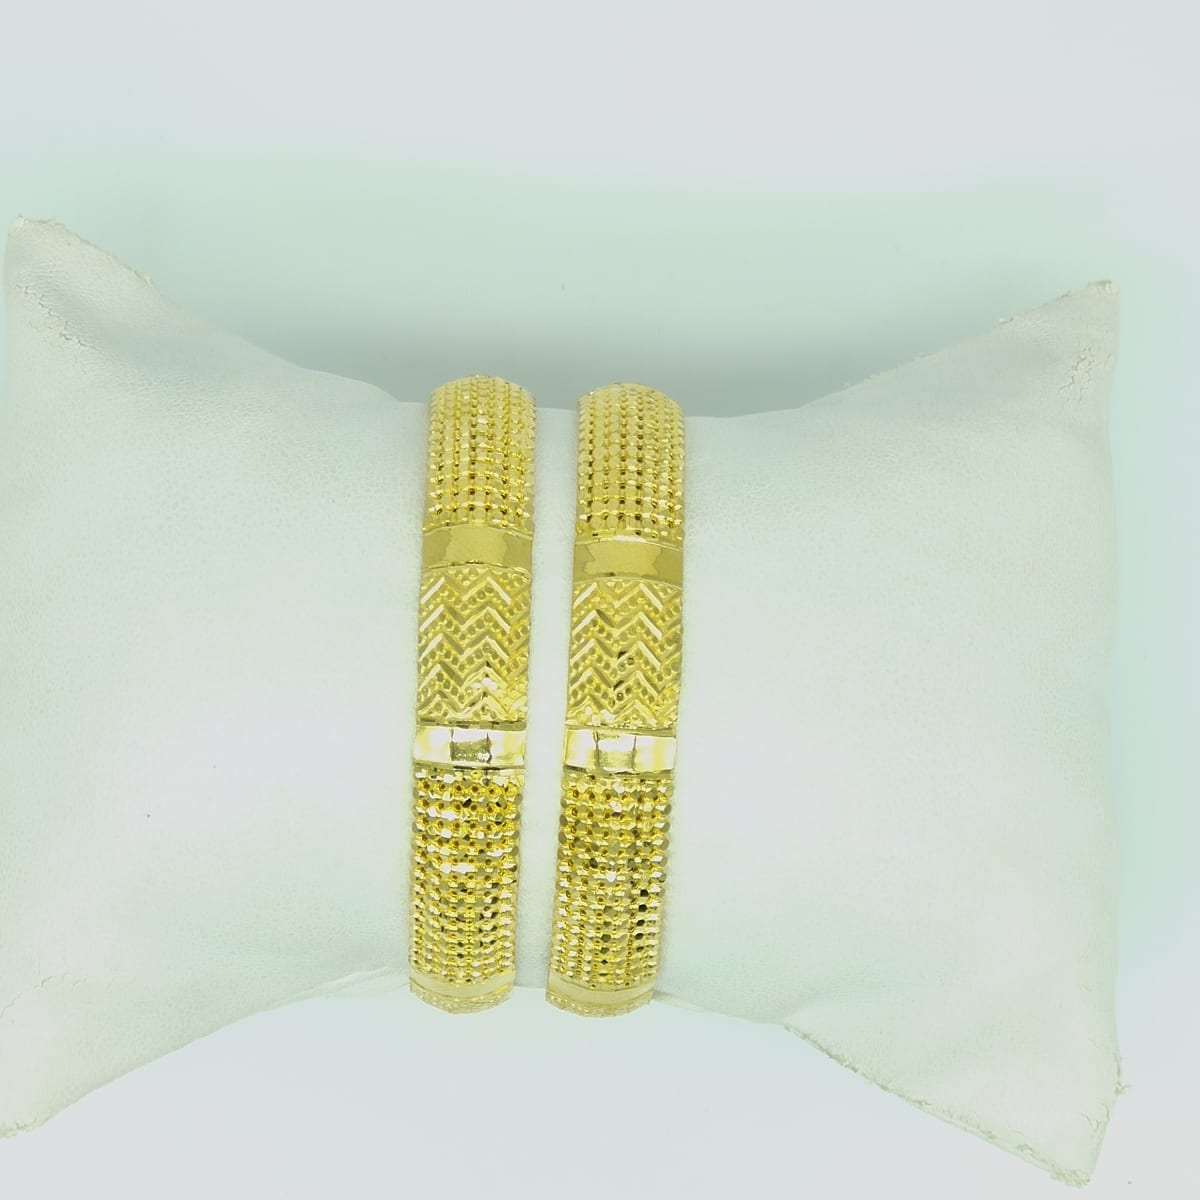 Gold Bangles  Top Design For Ladies - 2pcs